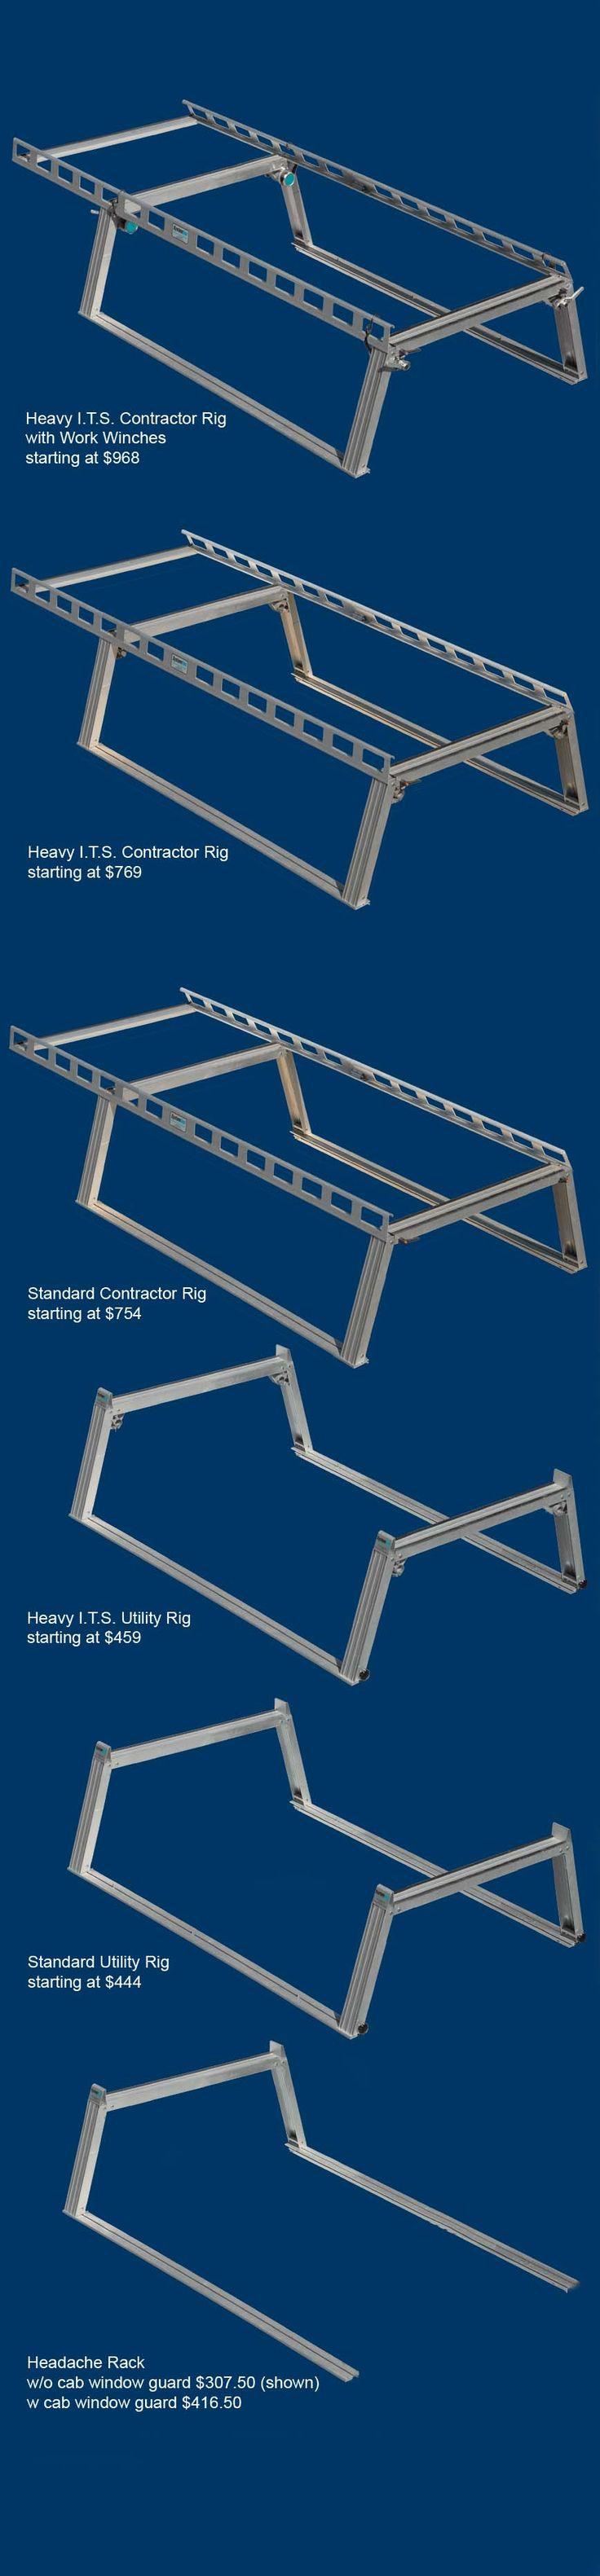 Service body / utility body ladder racks / truck racks overview